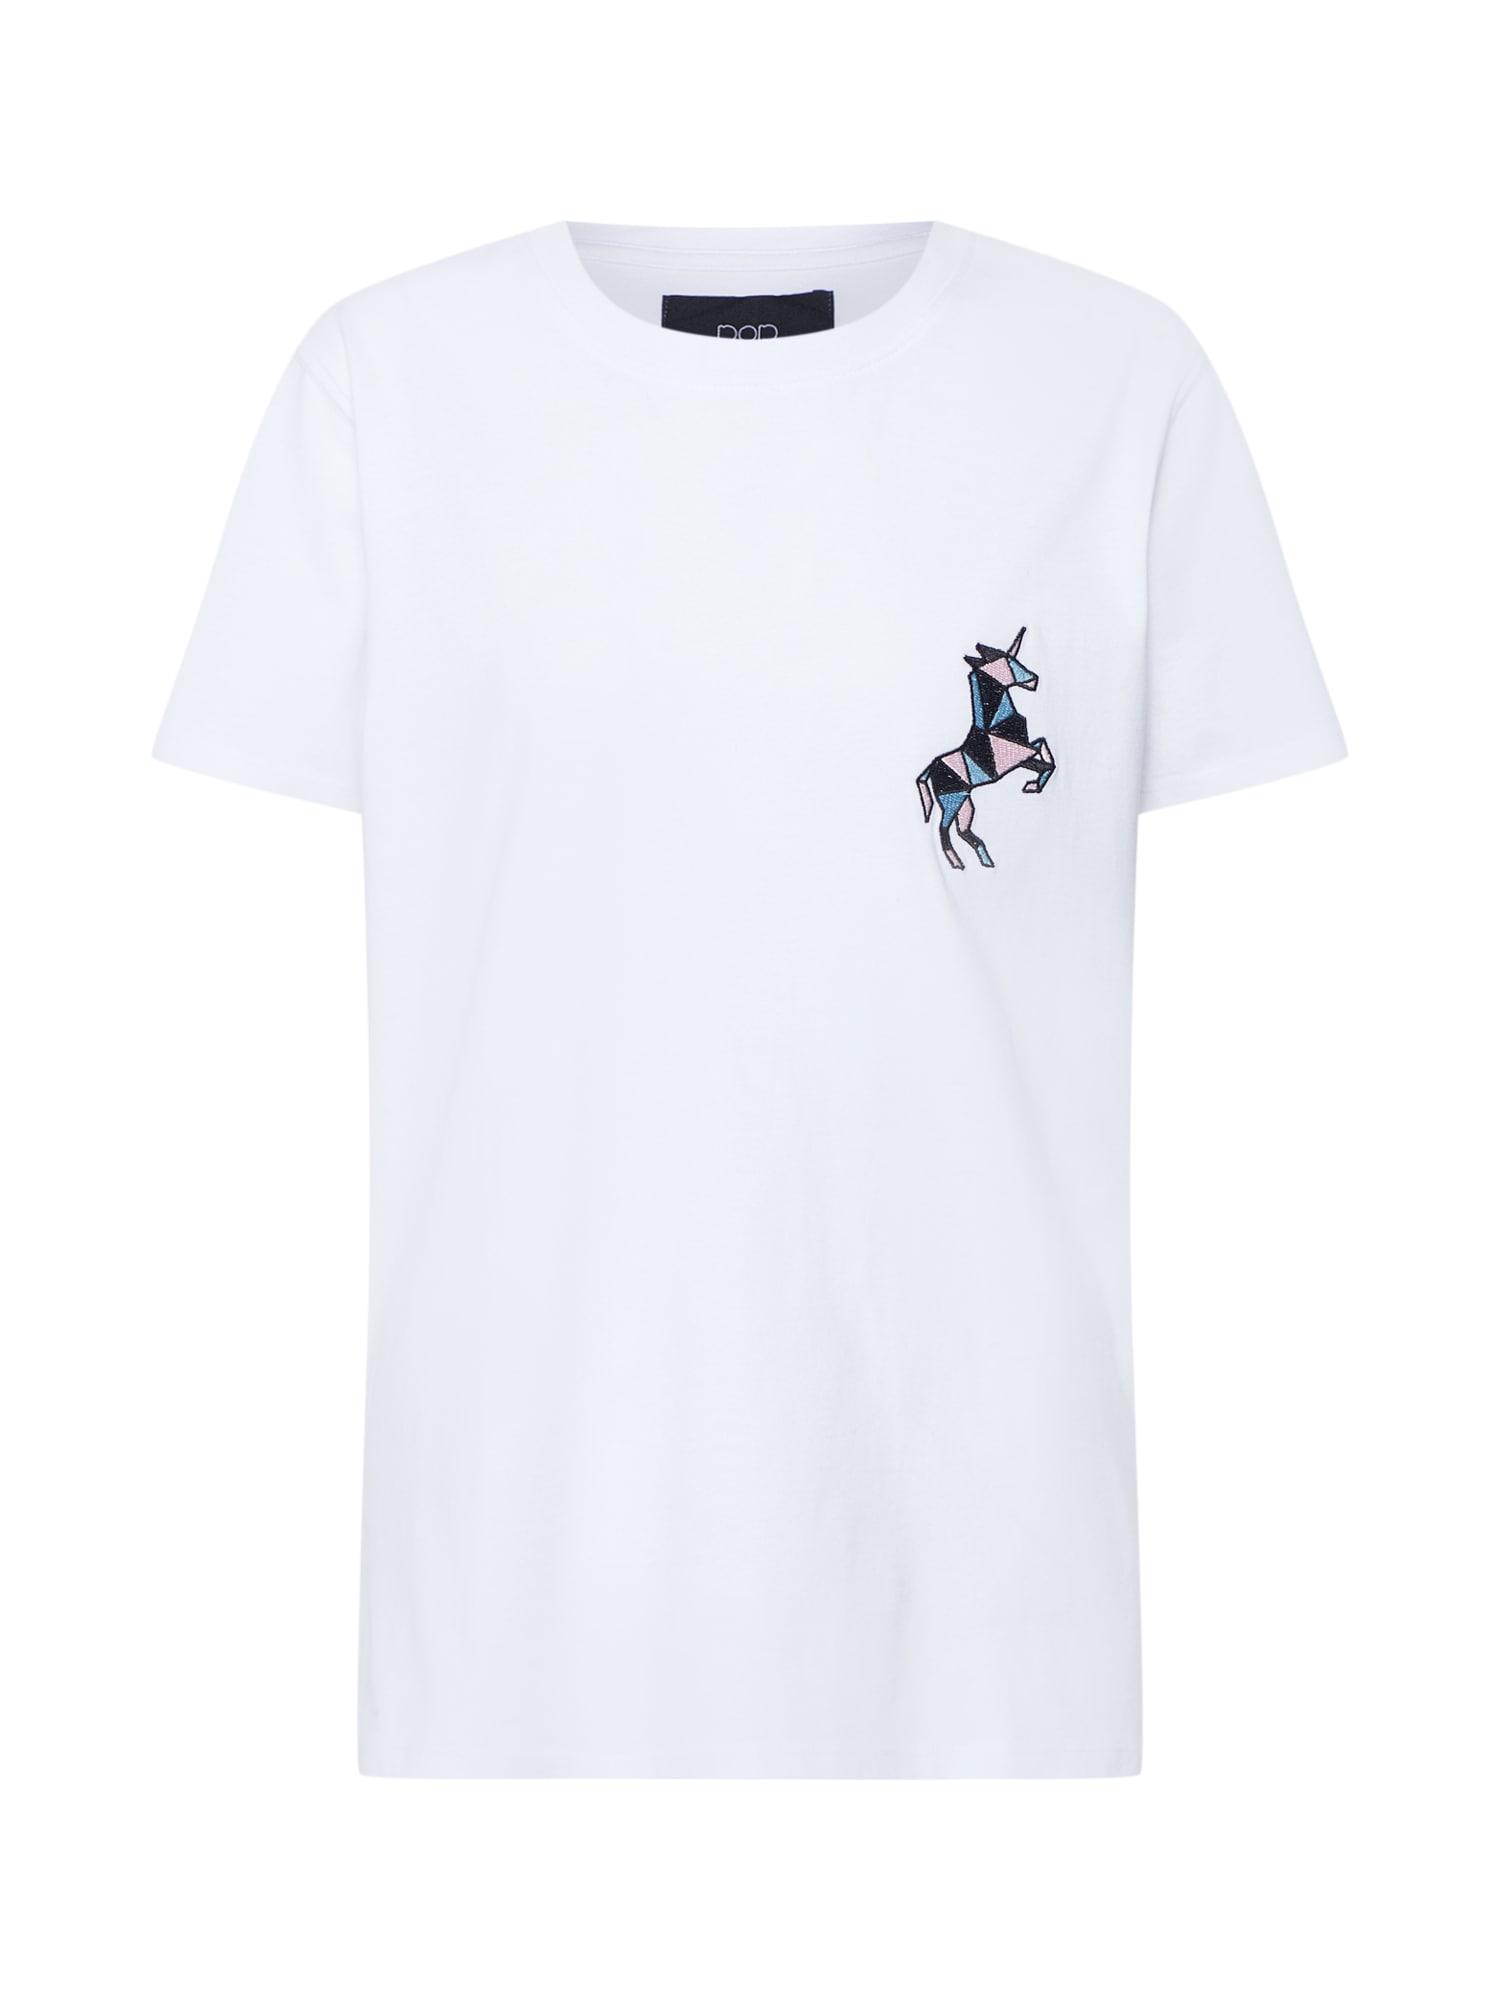 Tričko Unicorn Embroidery Tee bílá Pop Copenhagen